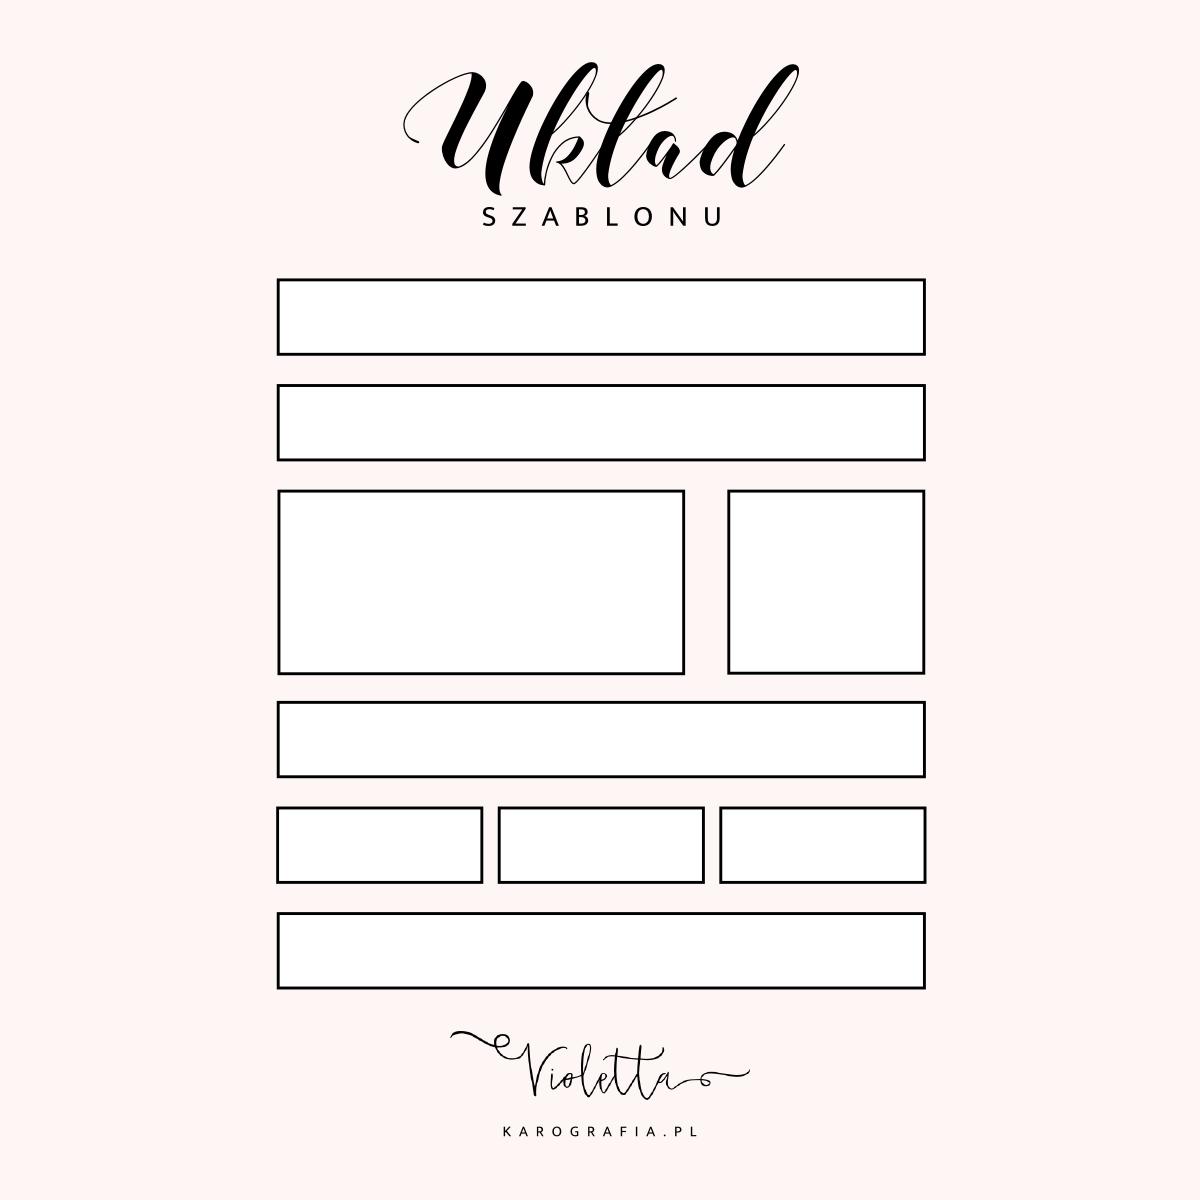 Szablon na blogspota do kupienia - (prawie) klasyczna Violetta!